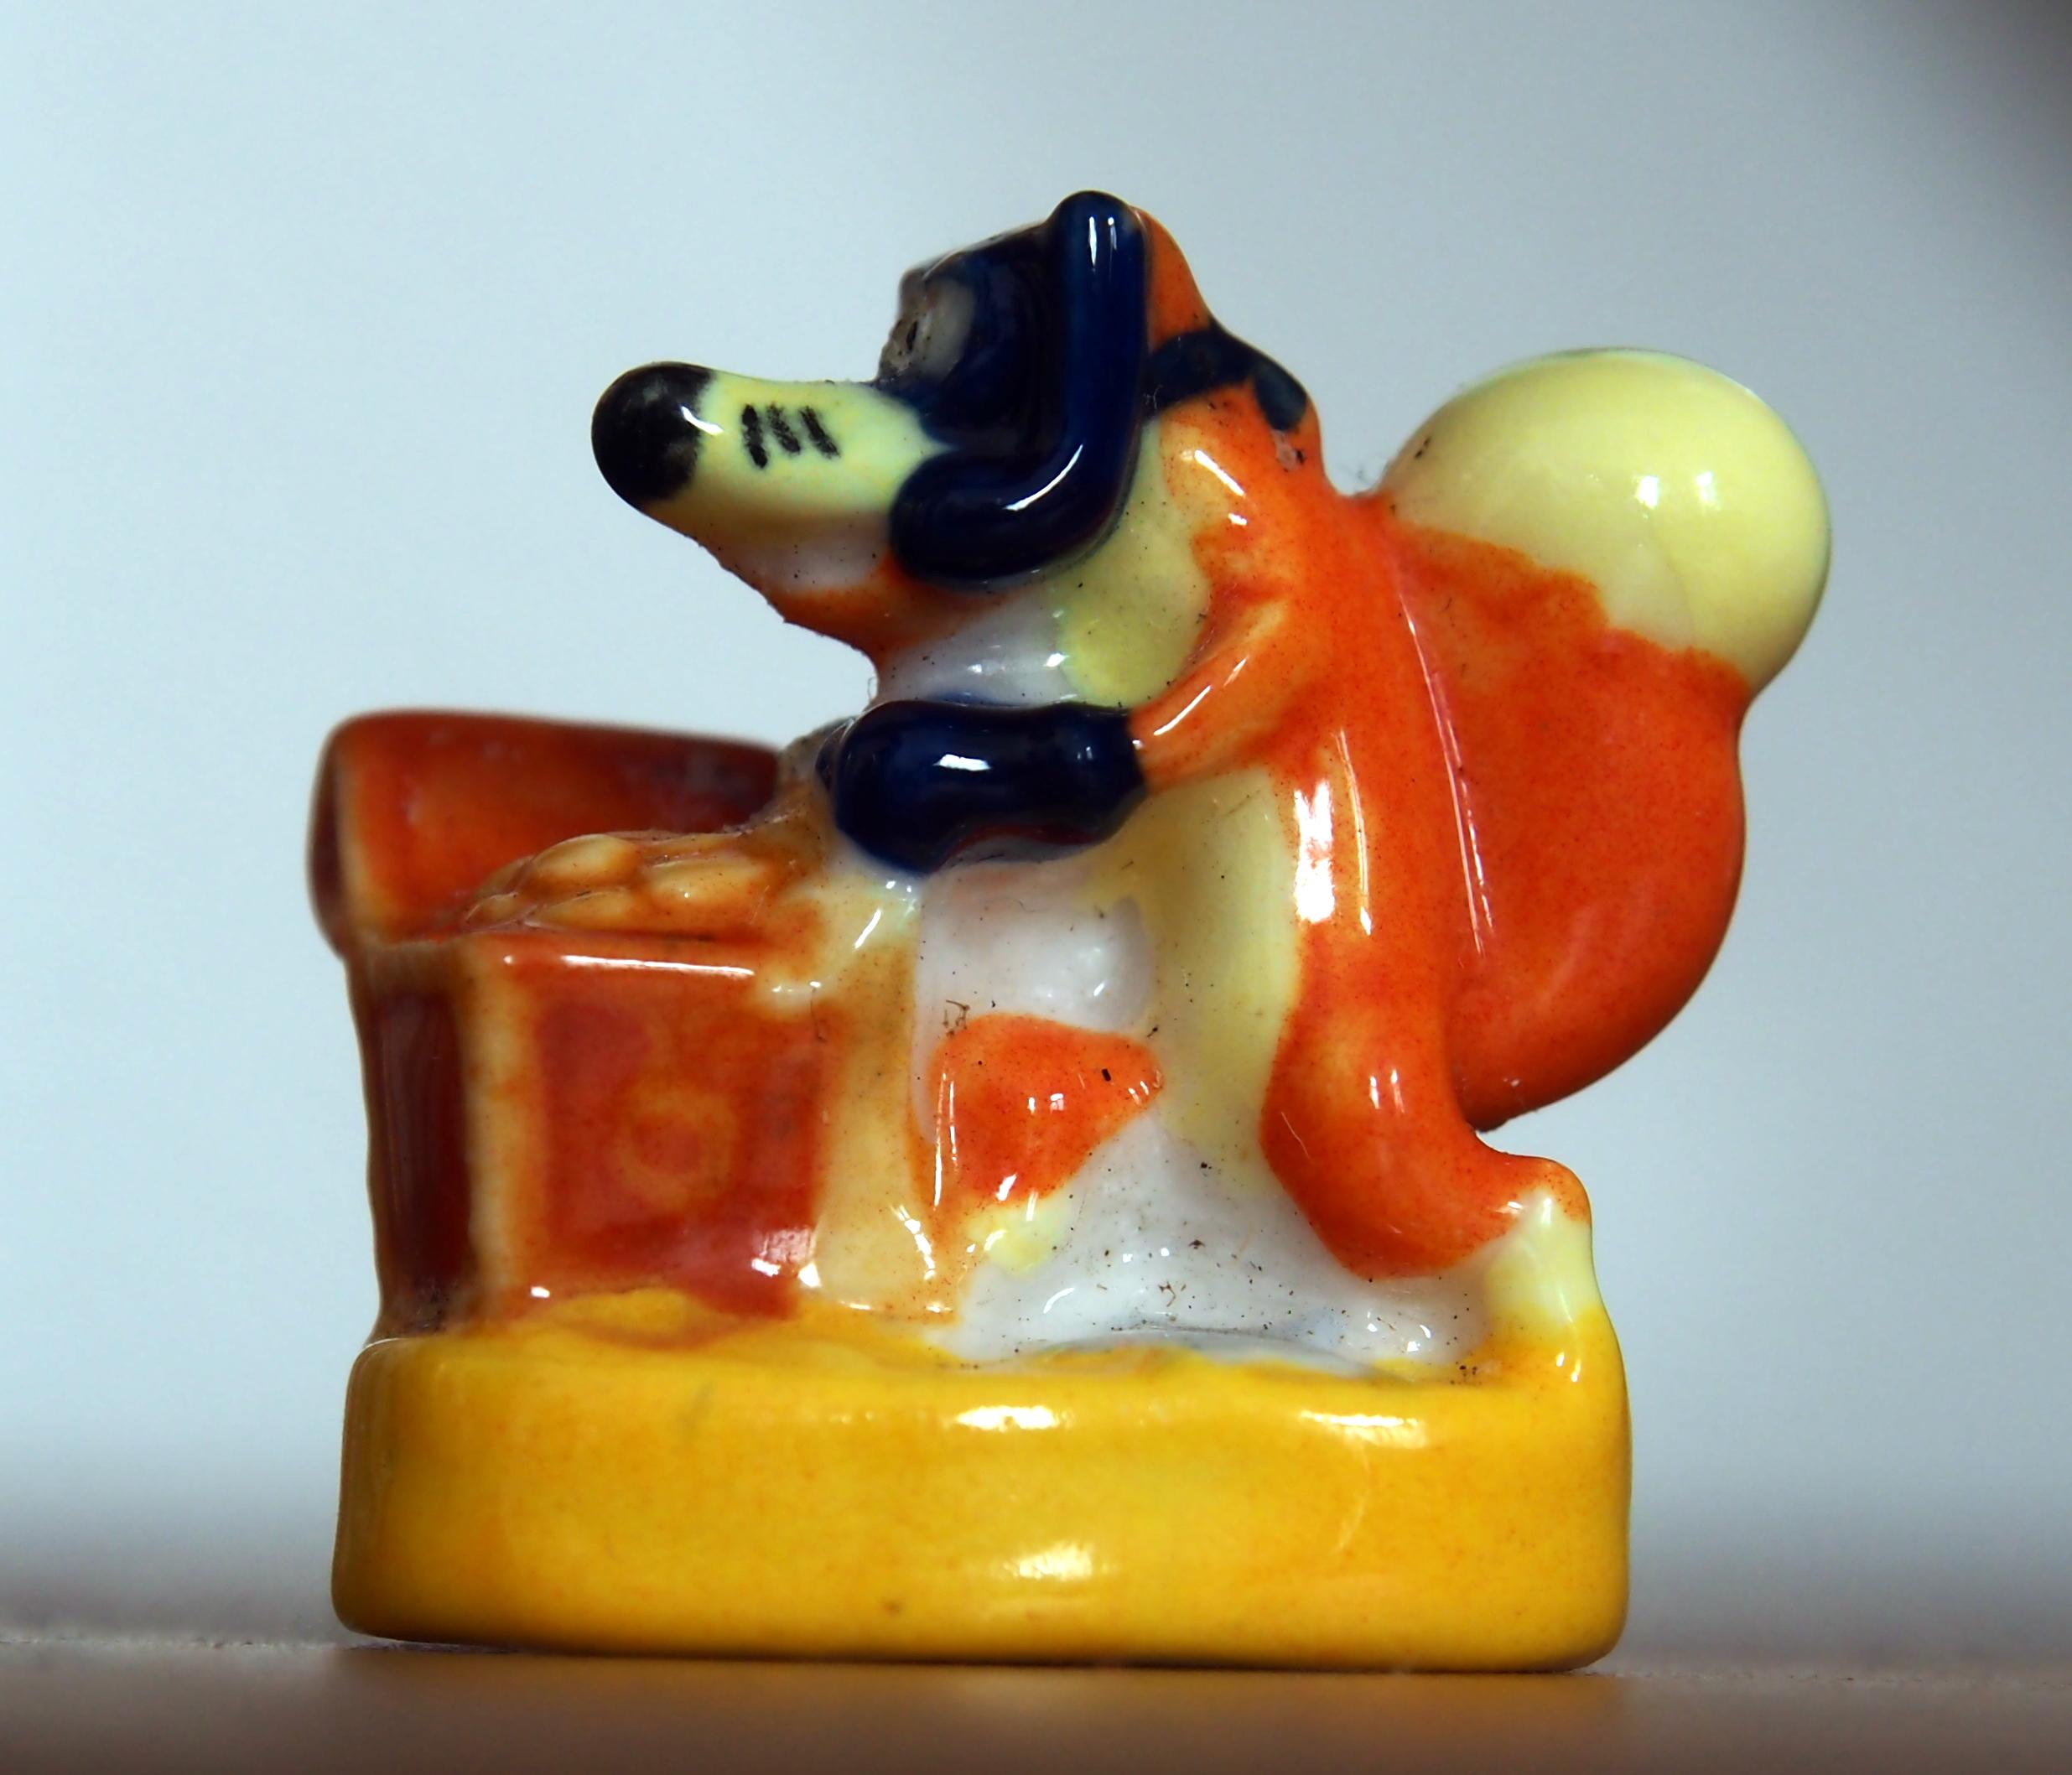 File strange animal porcelain feves et galette des rois photo2 jpg wikimedia commons - Date galette des rois ...